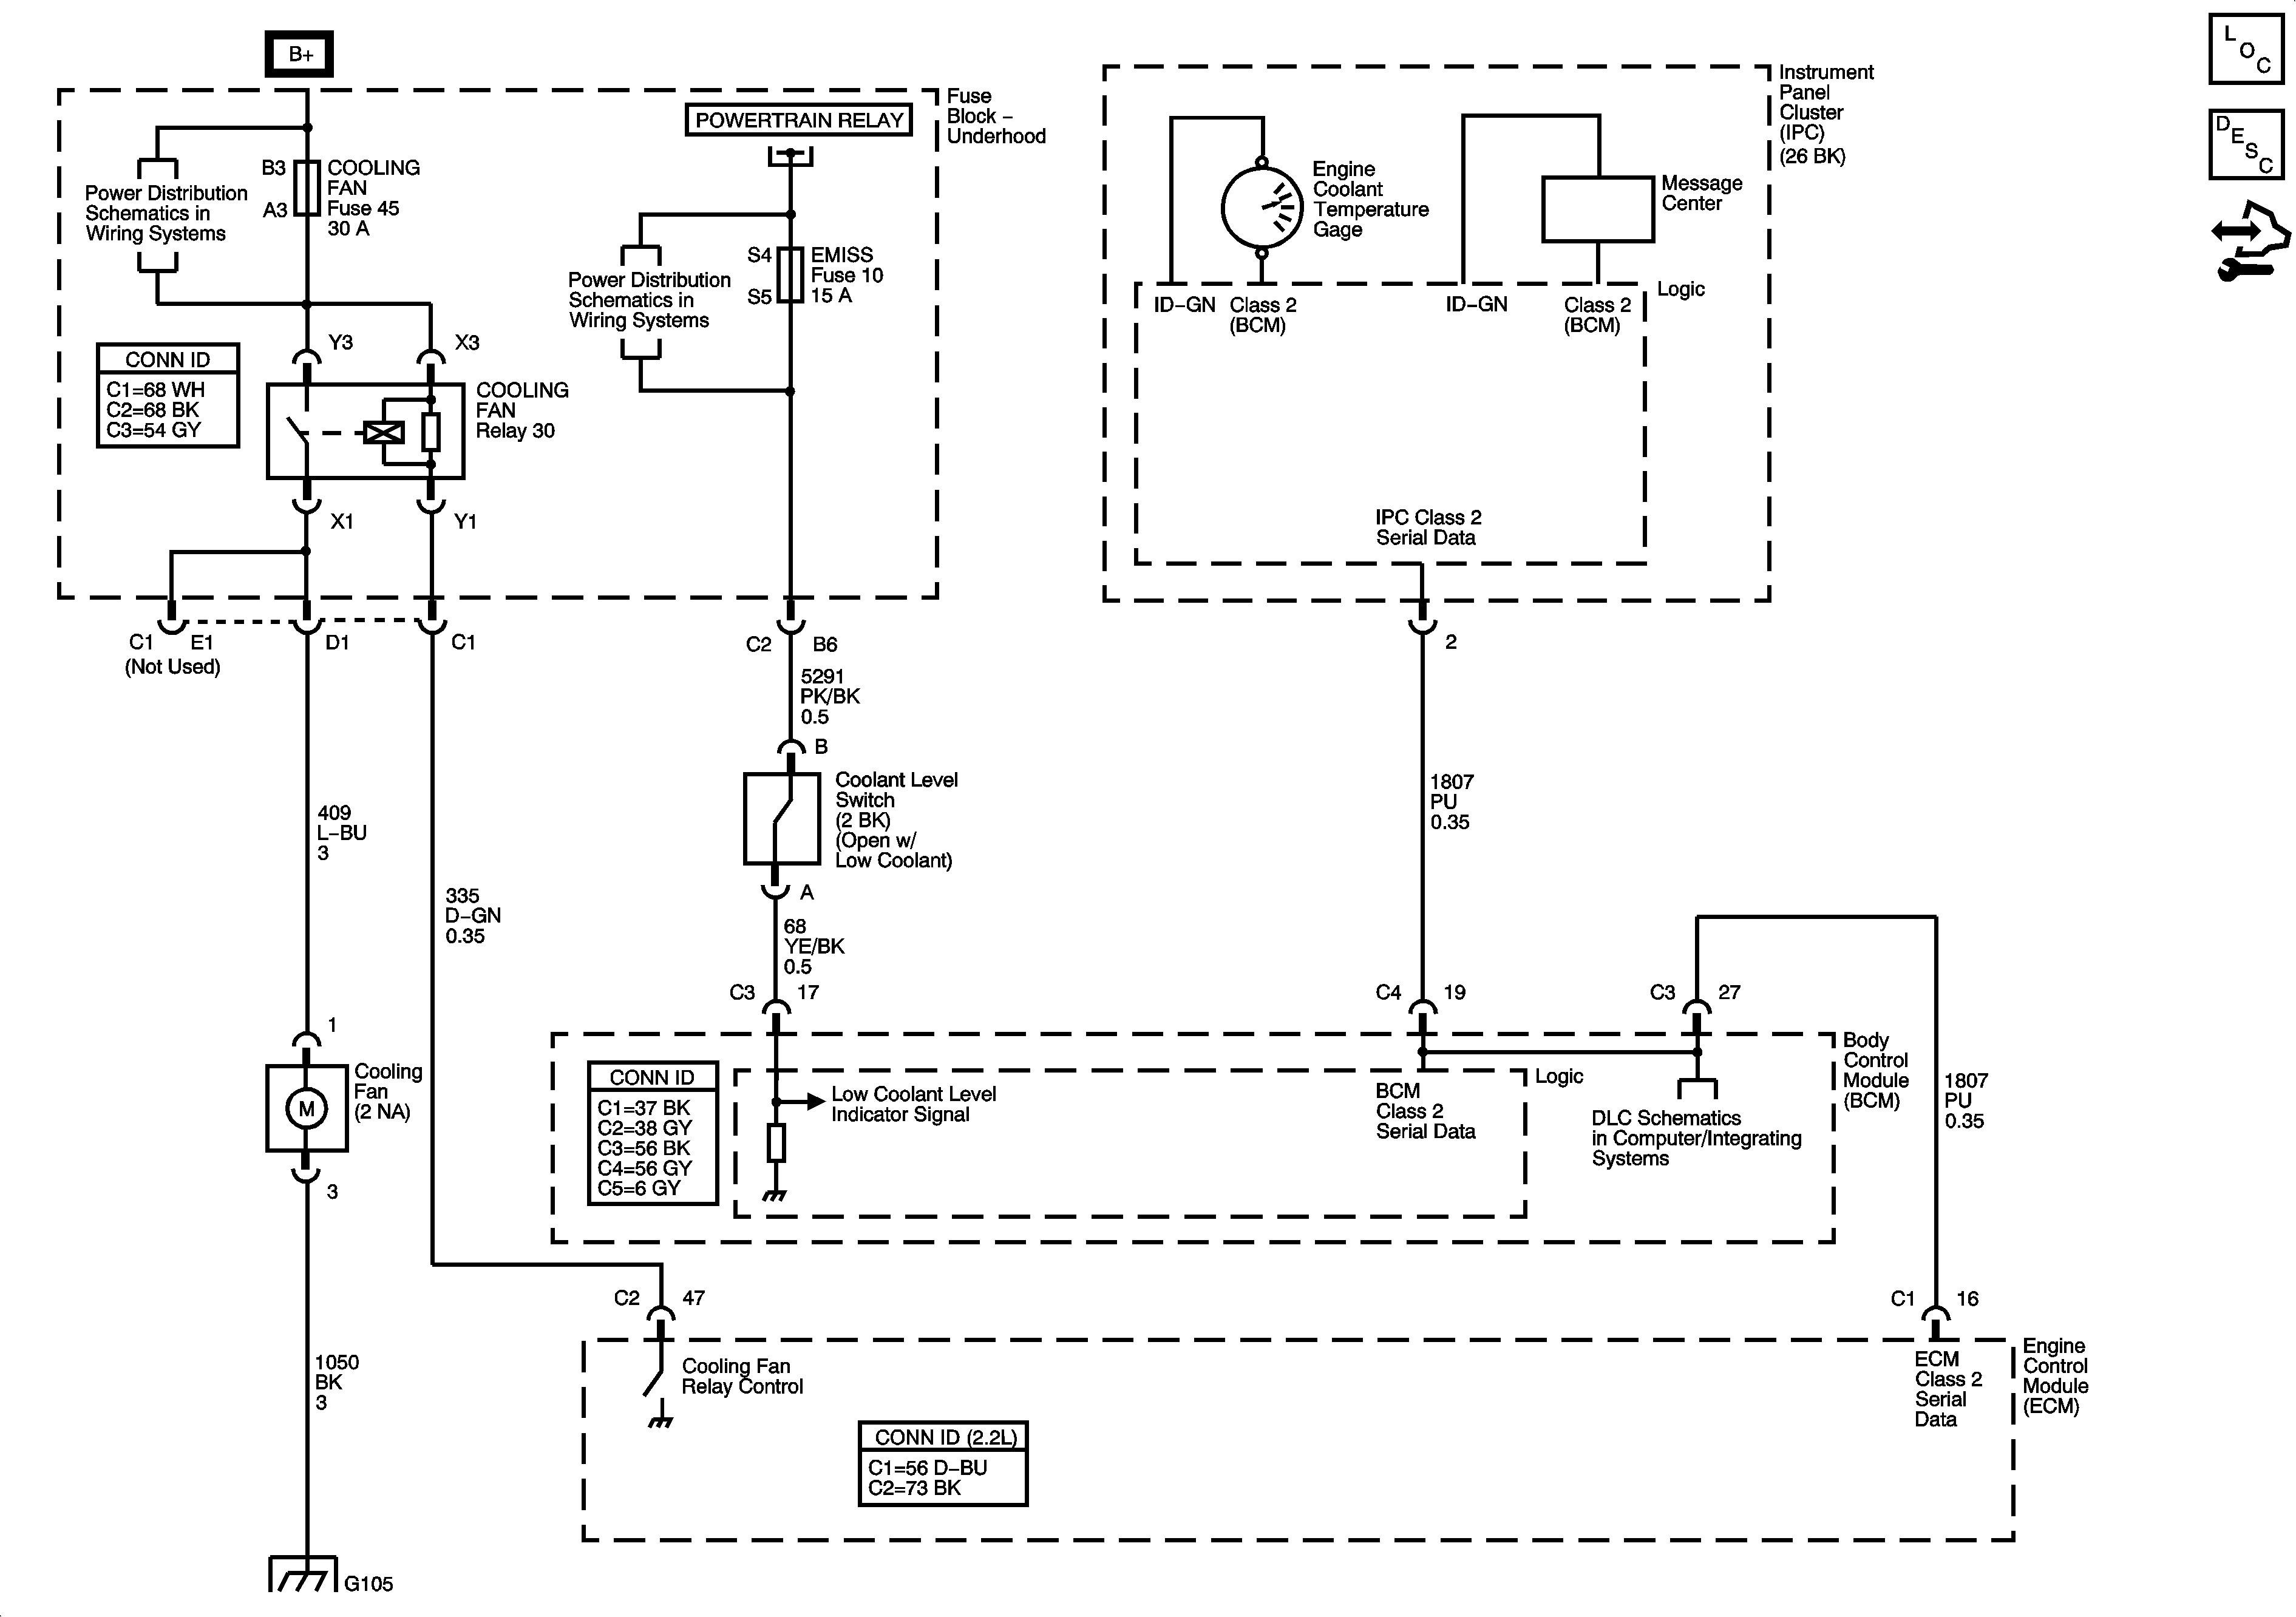 2004 Saturn Ion Engine Diagram 2003 Saturn Vue Wiring Diagram Sbrowne Me Uploads Di 2001 Sl1 Of 2004 Saturn Ion Engine Diagram